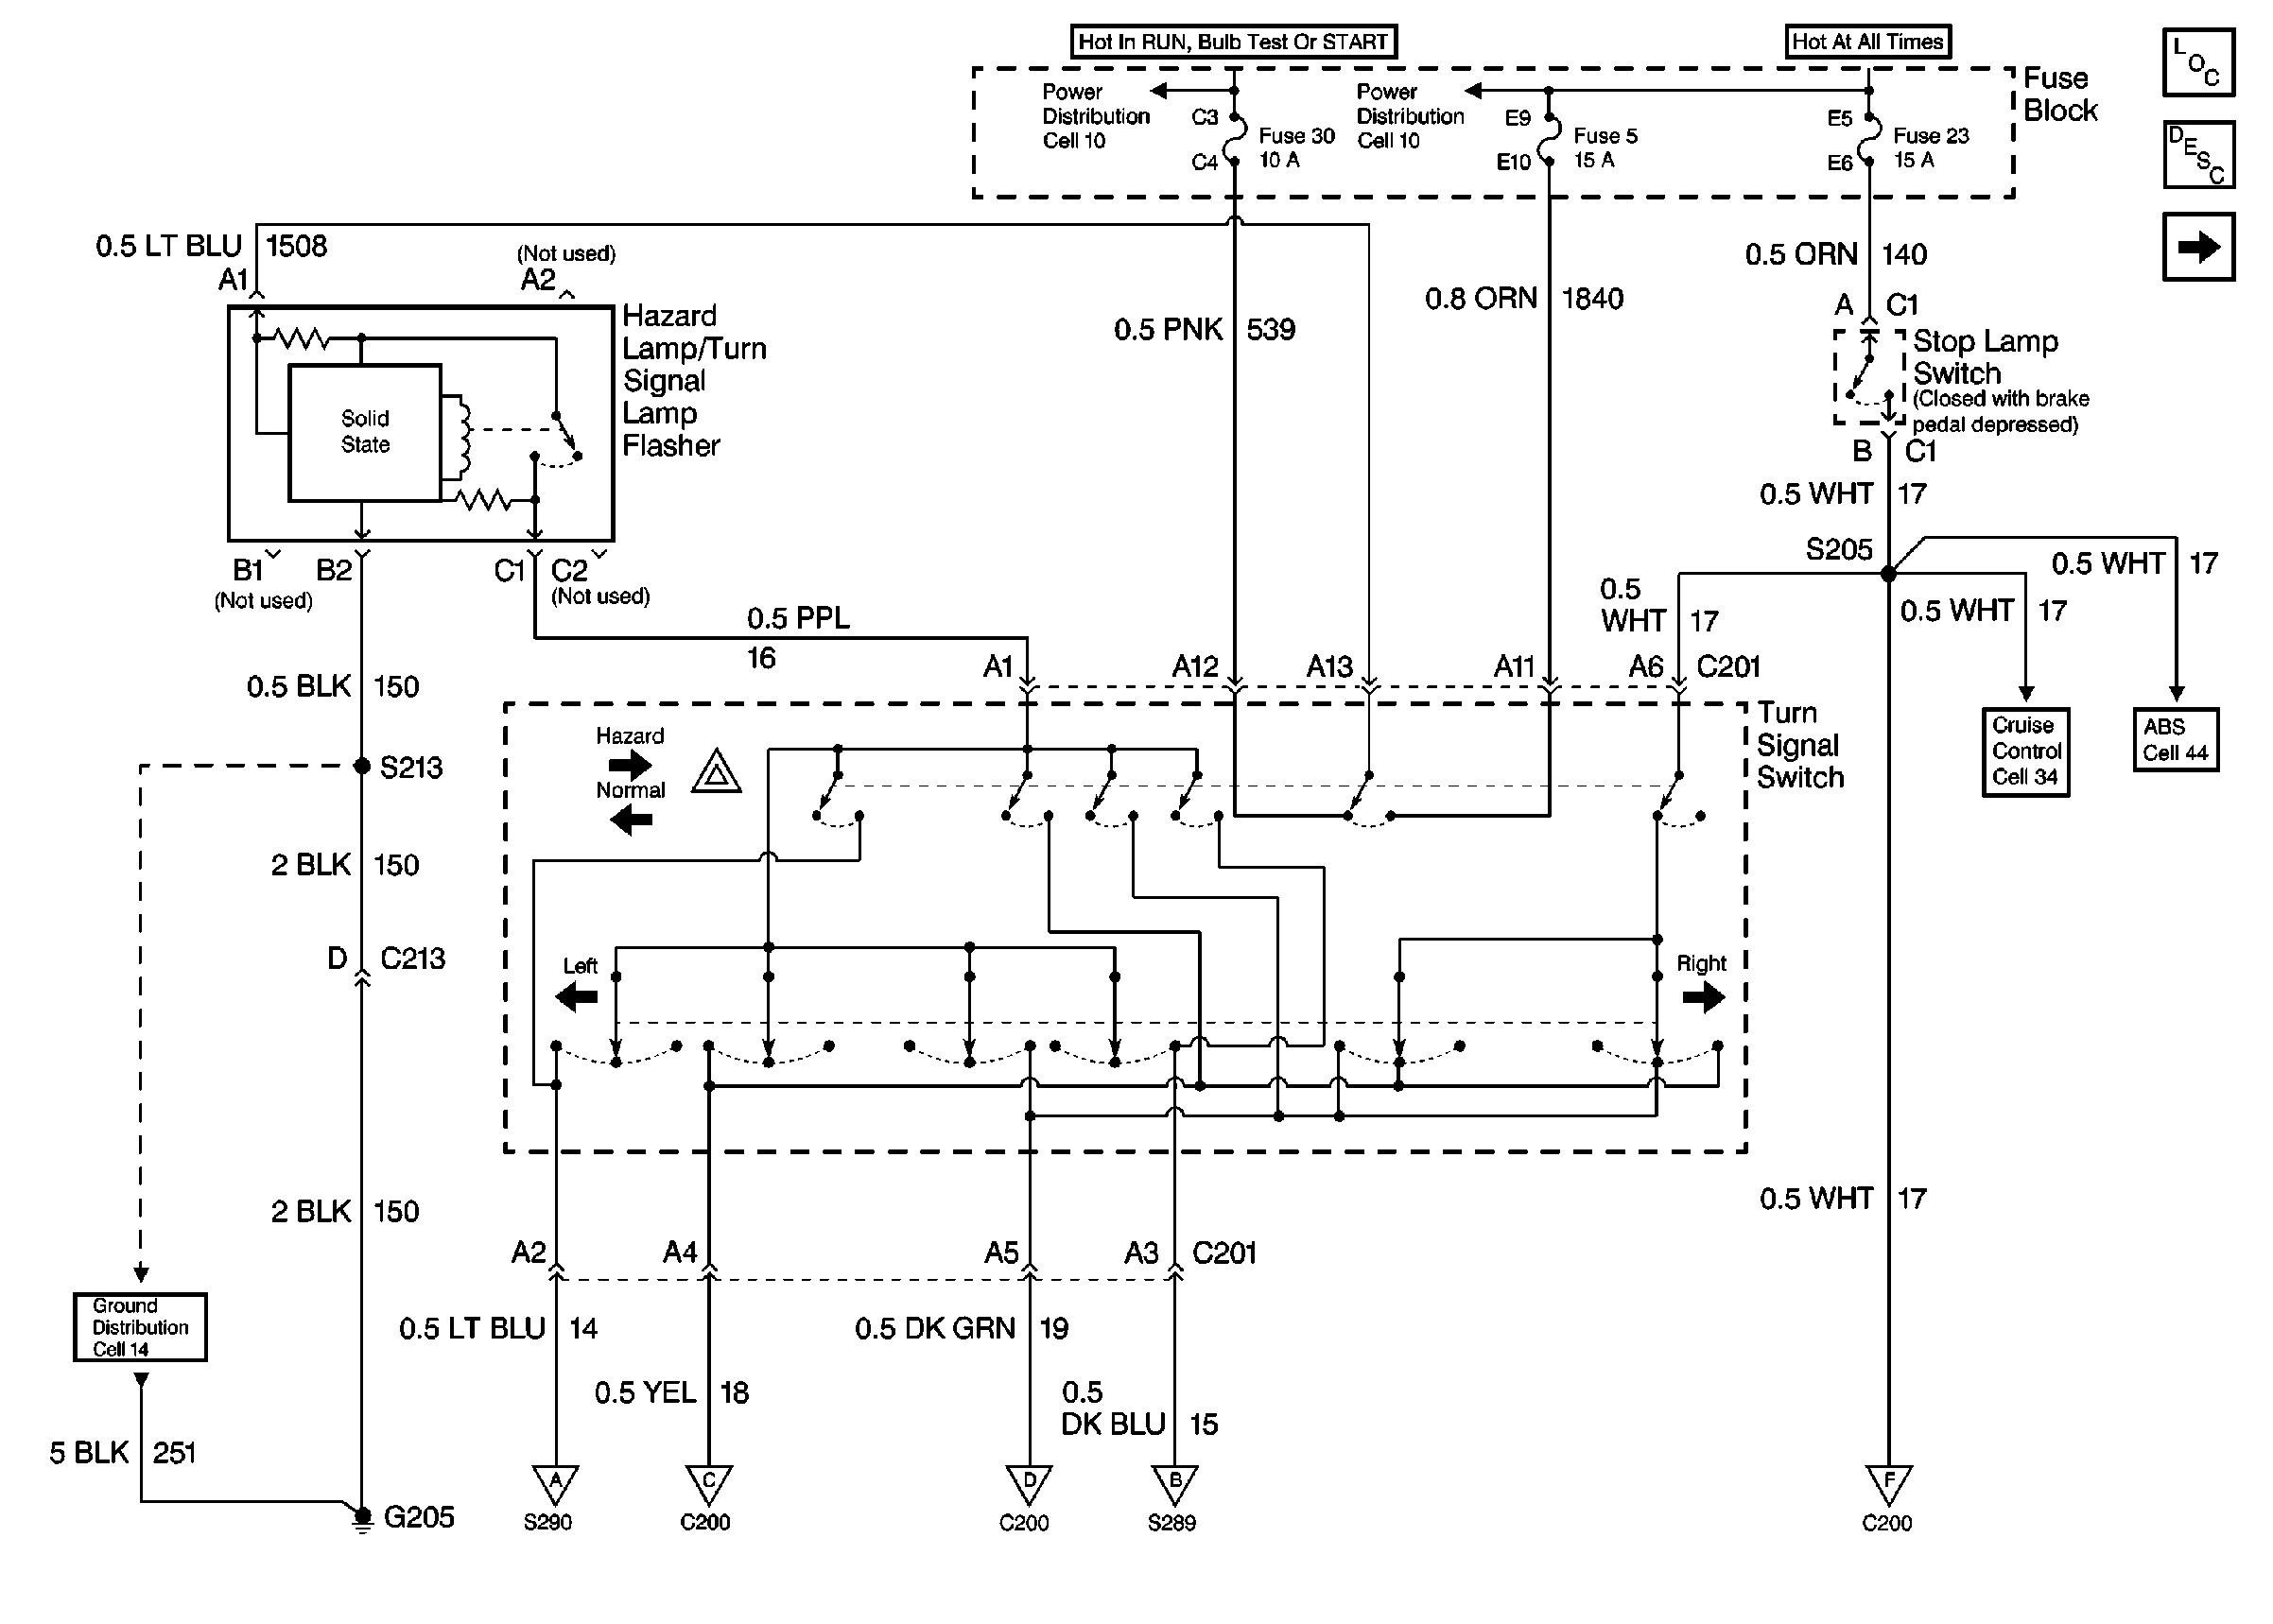 1994 Chevy Truck Brake Light Wiring Diagram Brake Light Wiring Diagram Chevy Of 1994 Chevy Truck Brake Light Wiring Diagram